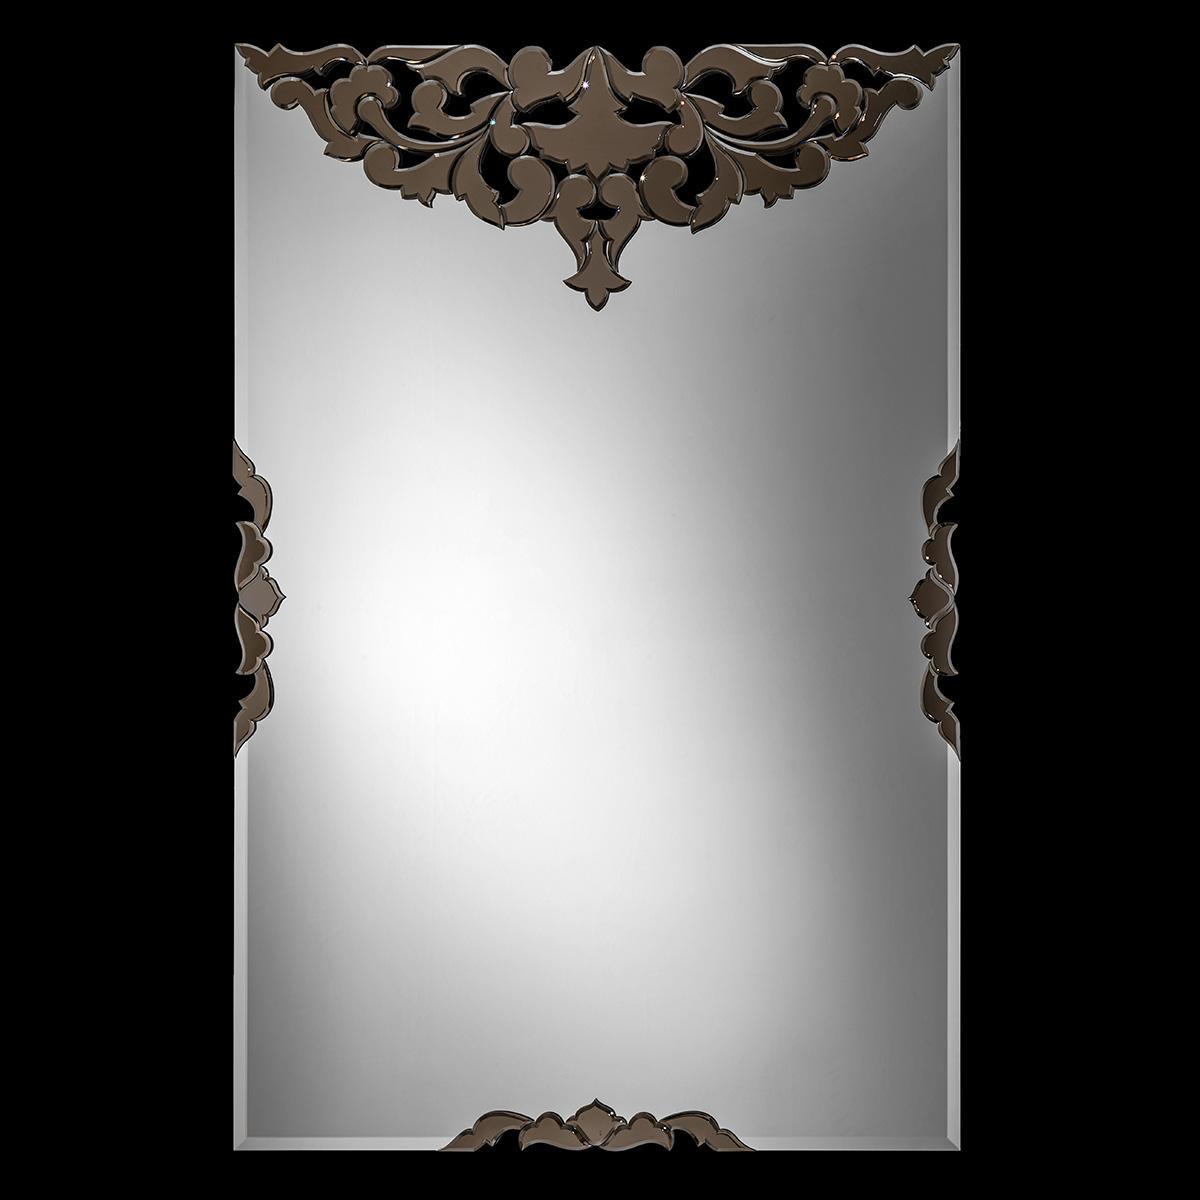 """Chiara"" miroir vénitien en verre de Murano"